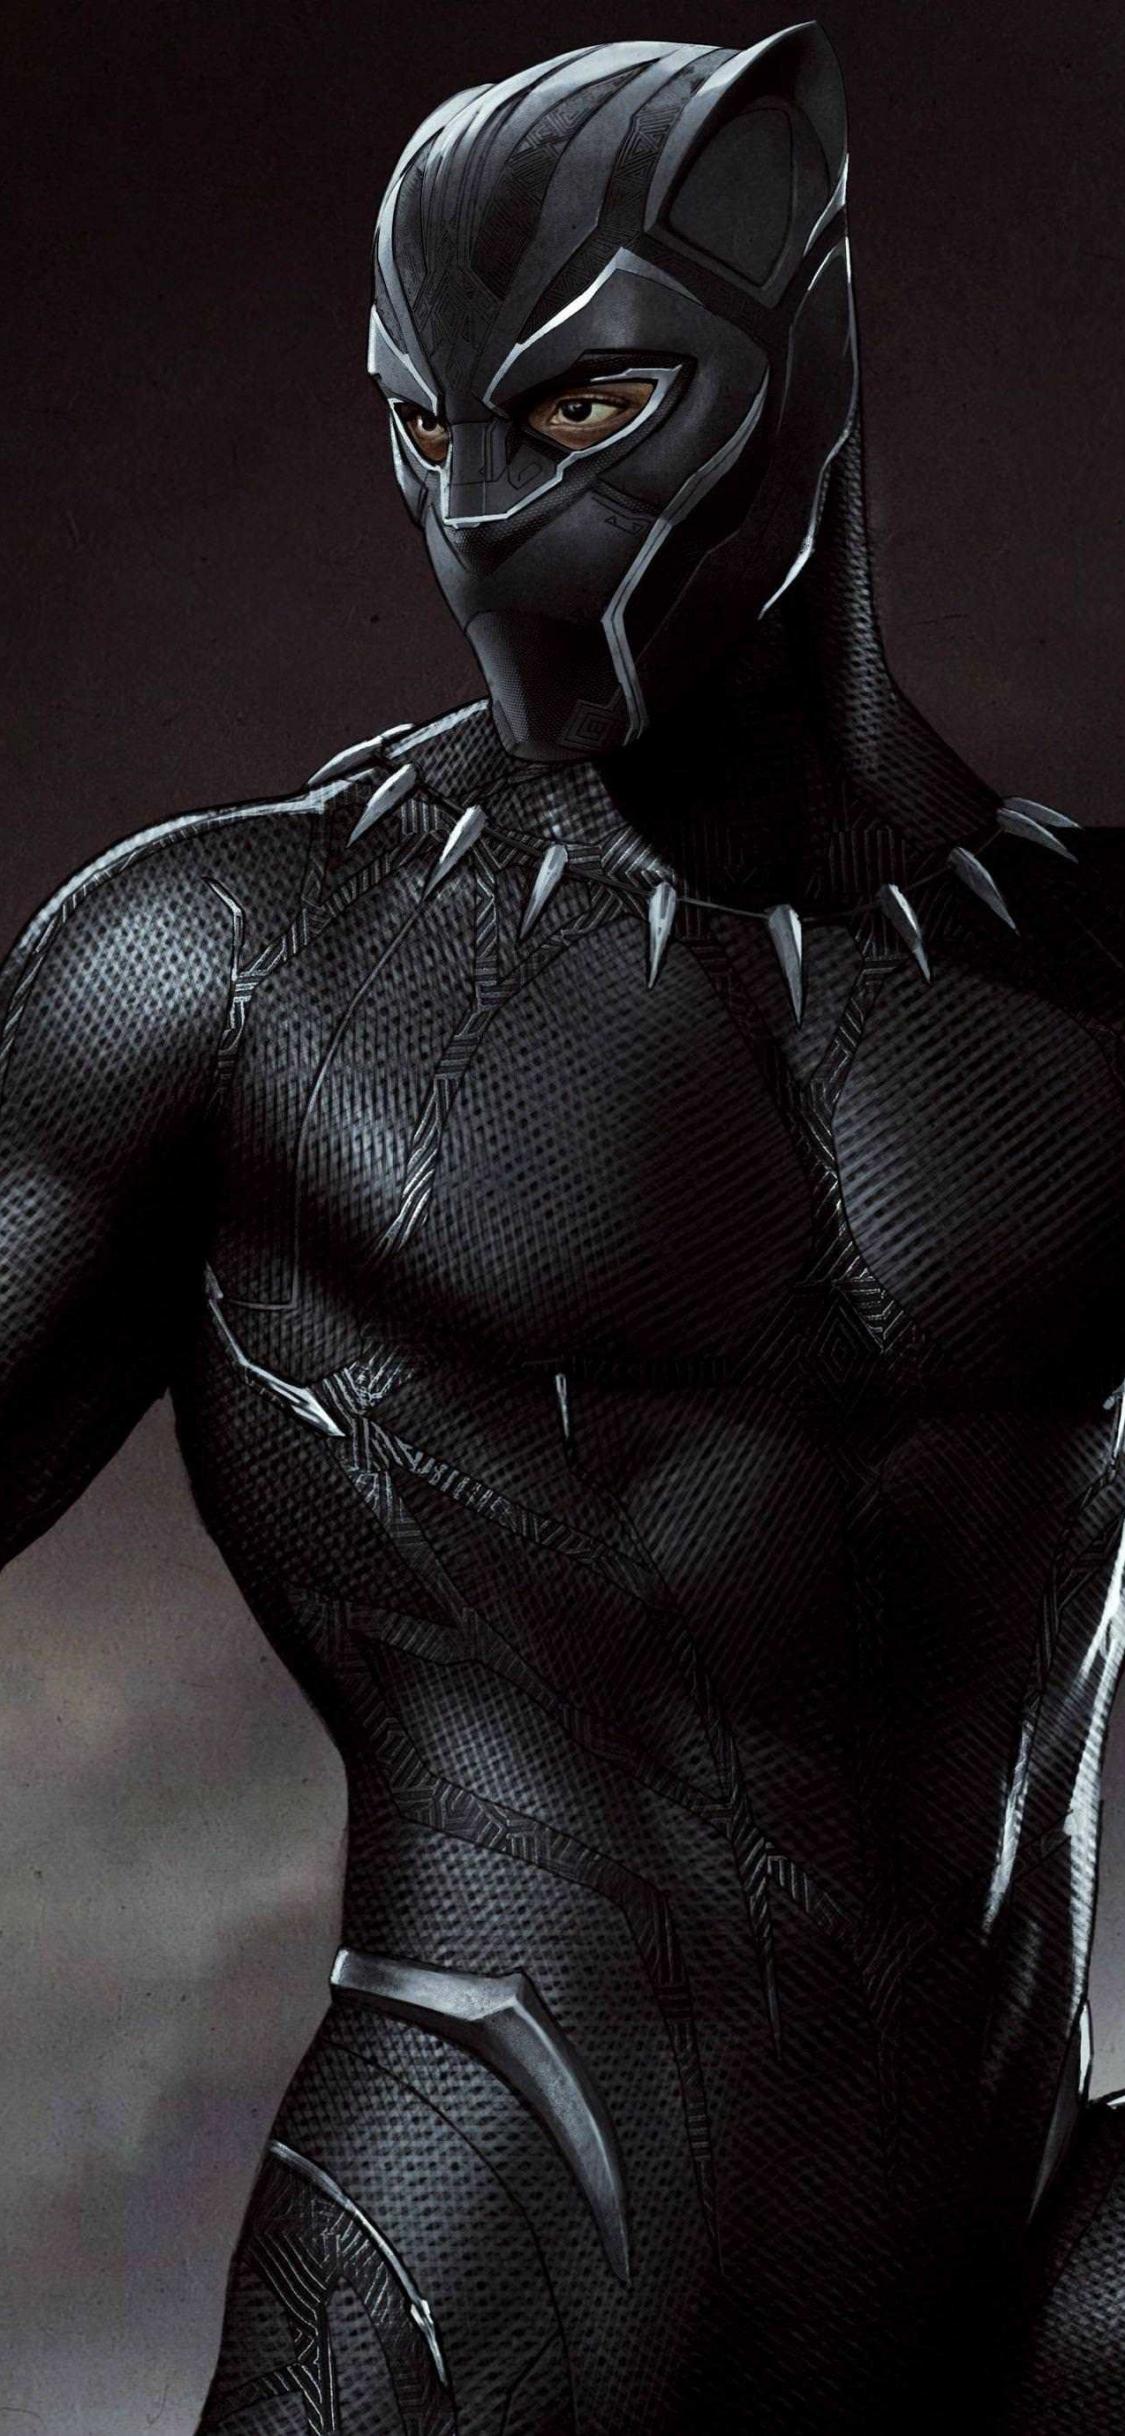 Download 1125x2436 Wallpaper Art Black Suit Black Panther